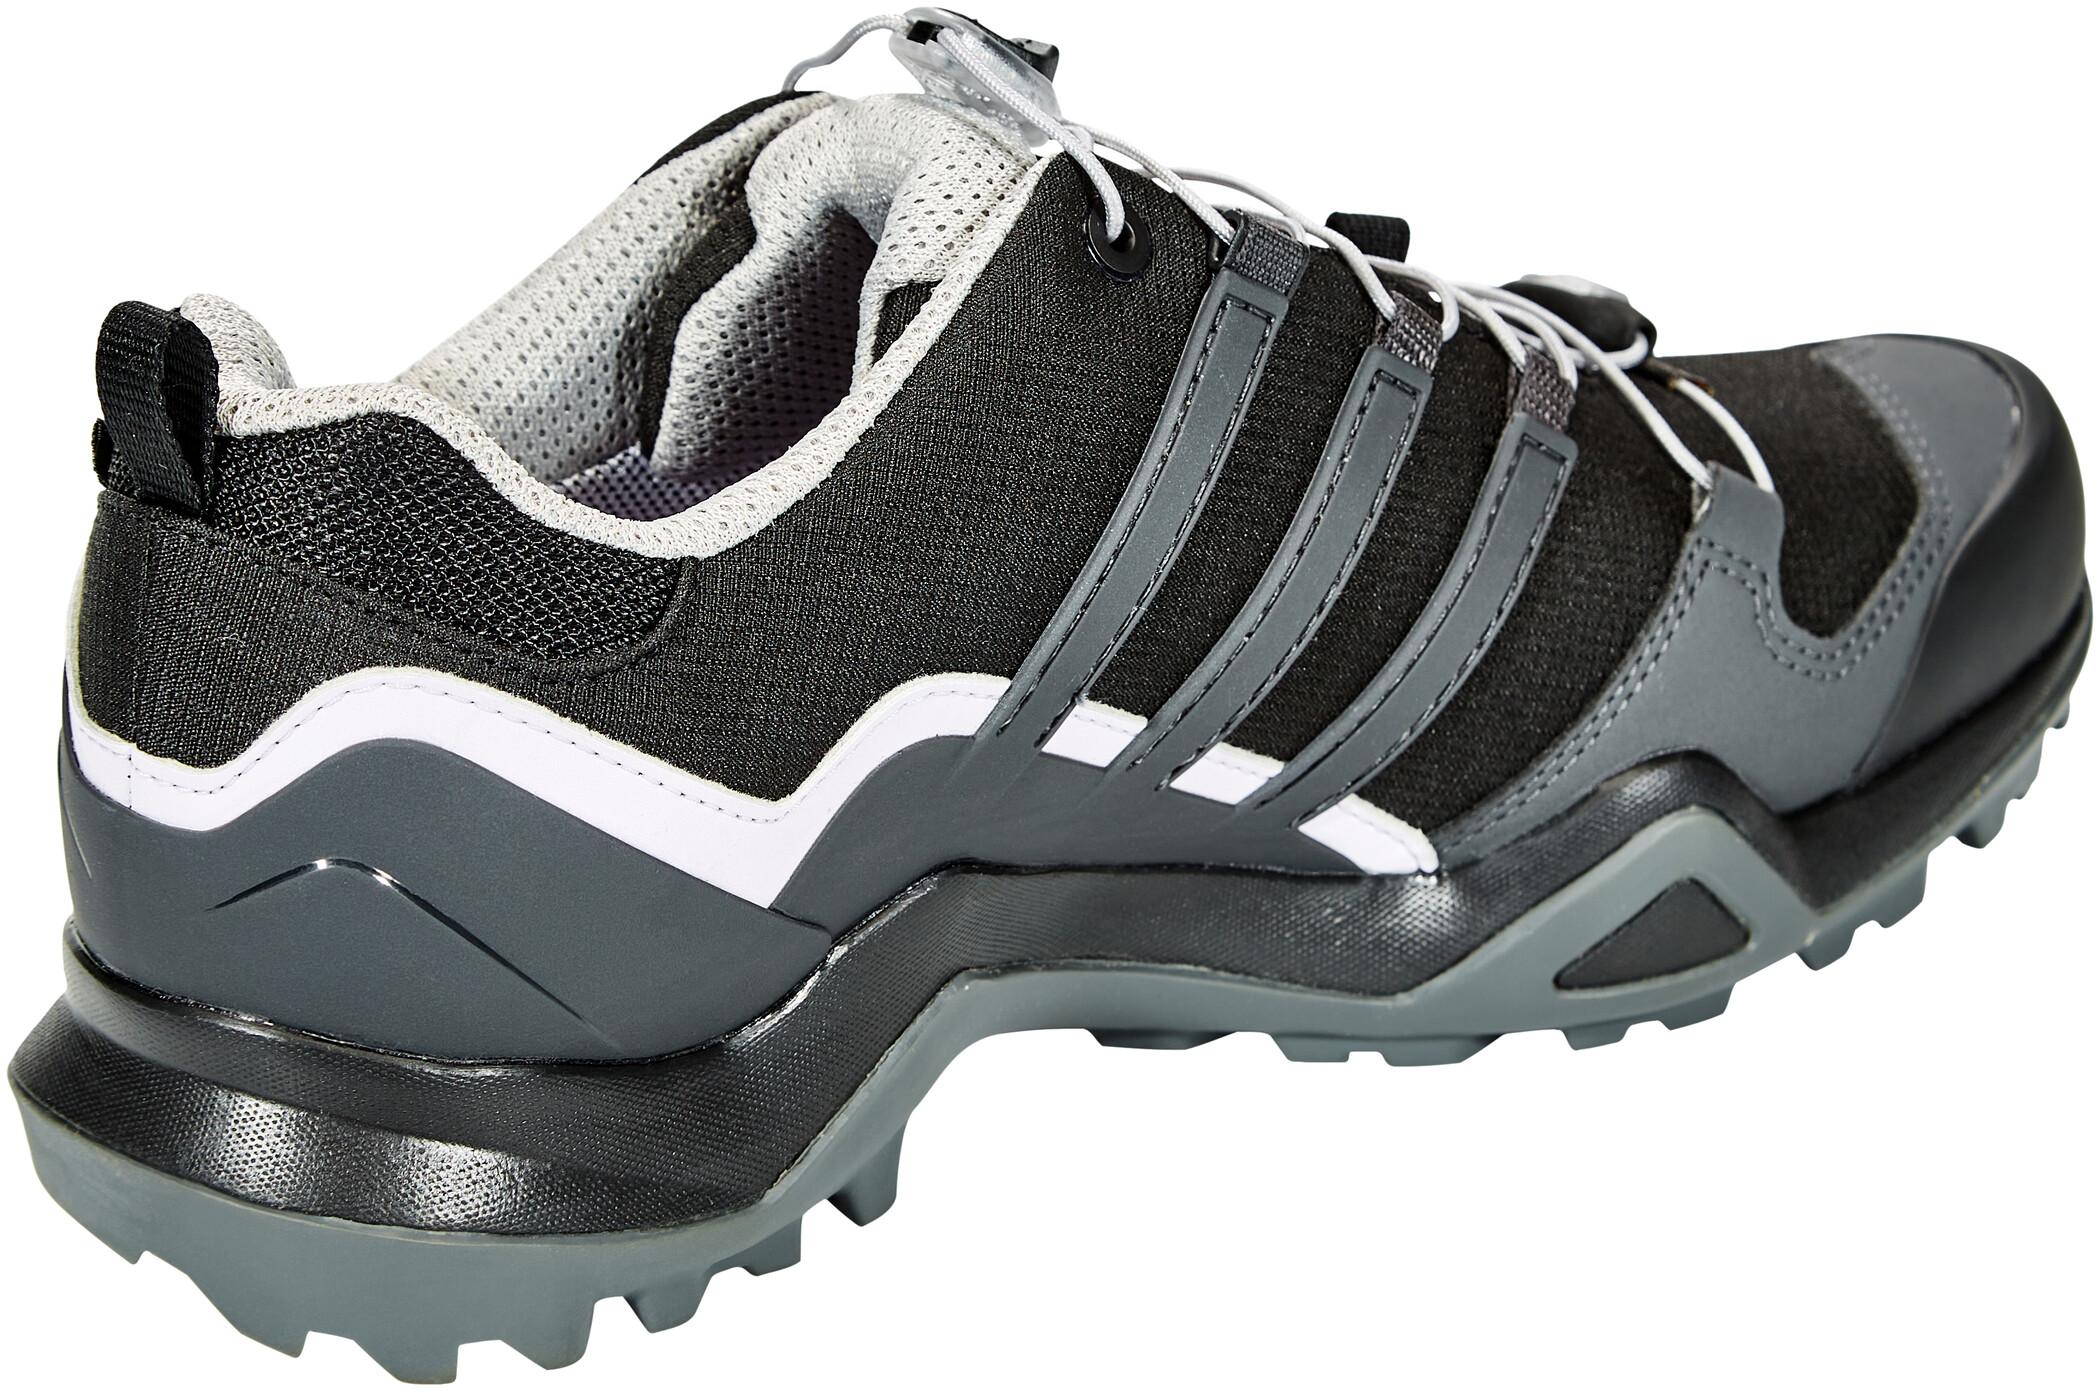 adidas TERREX Swift R2 Gore Tex Wanderschuhe Damen core blackdgh solid greypurple tint